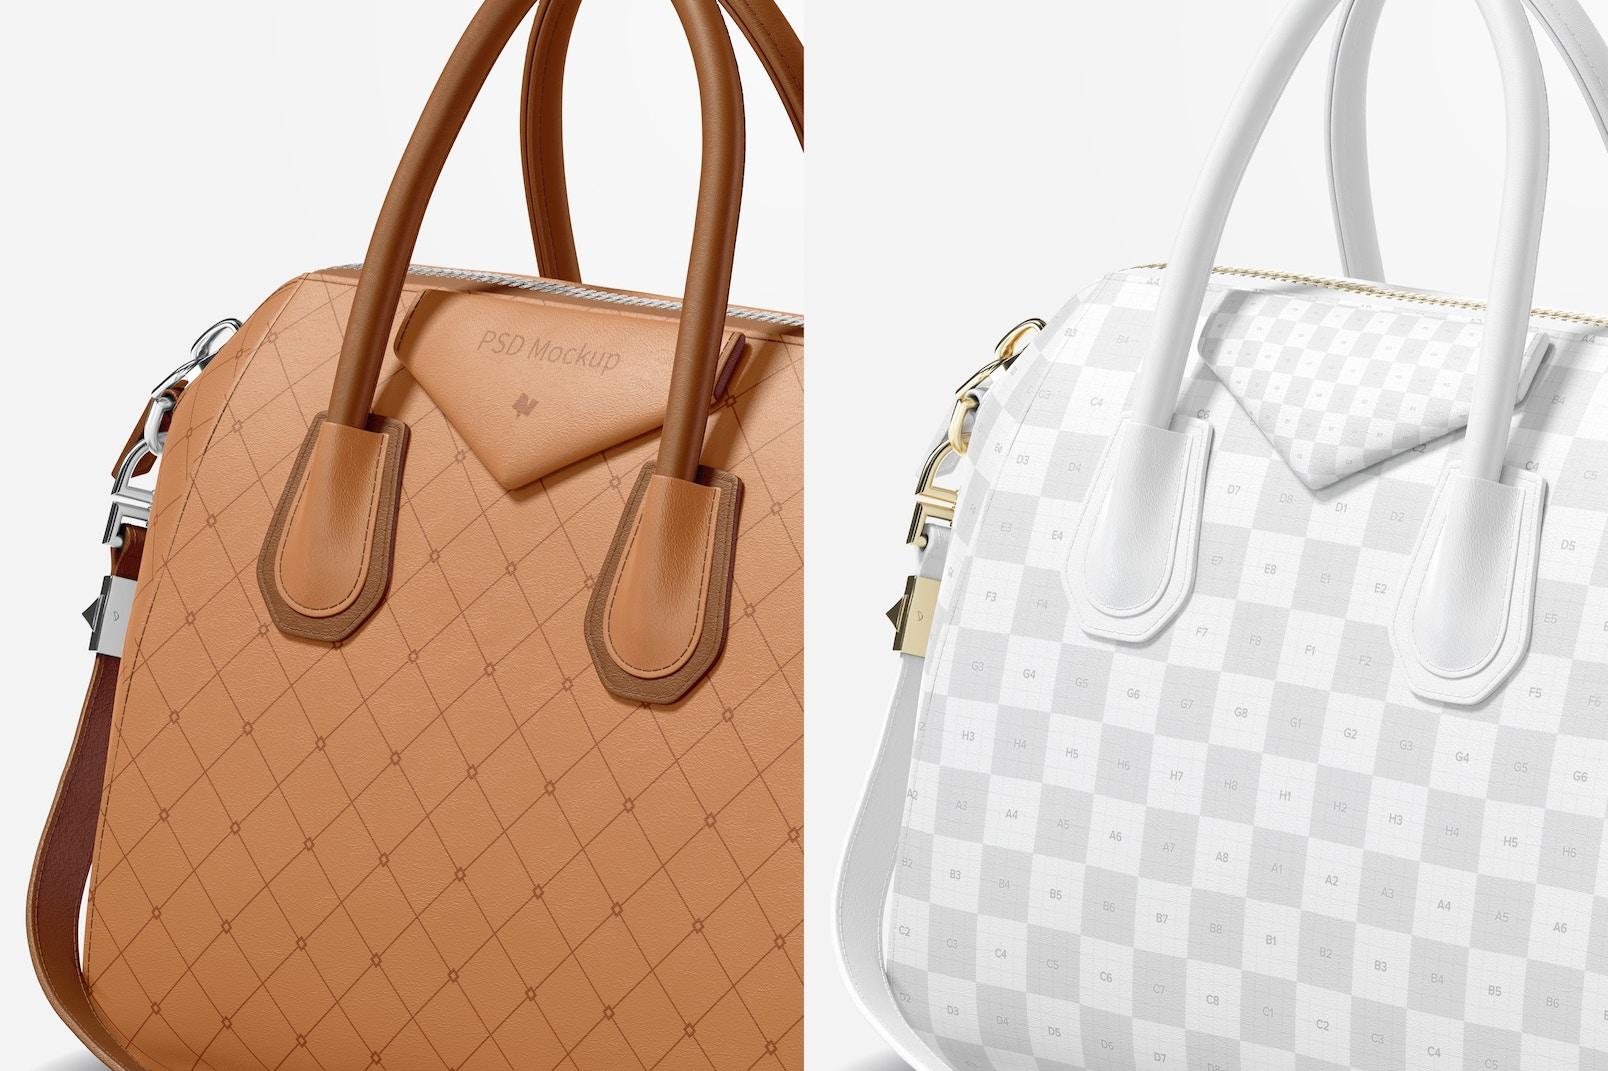 Women's Leather Bag Mockup, Close Up